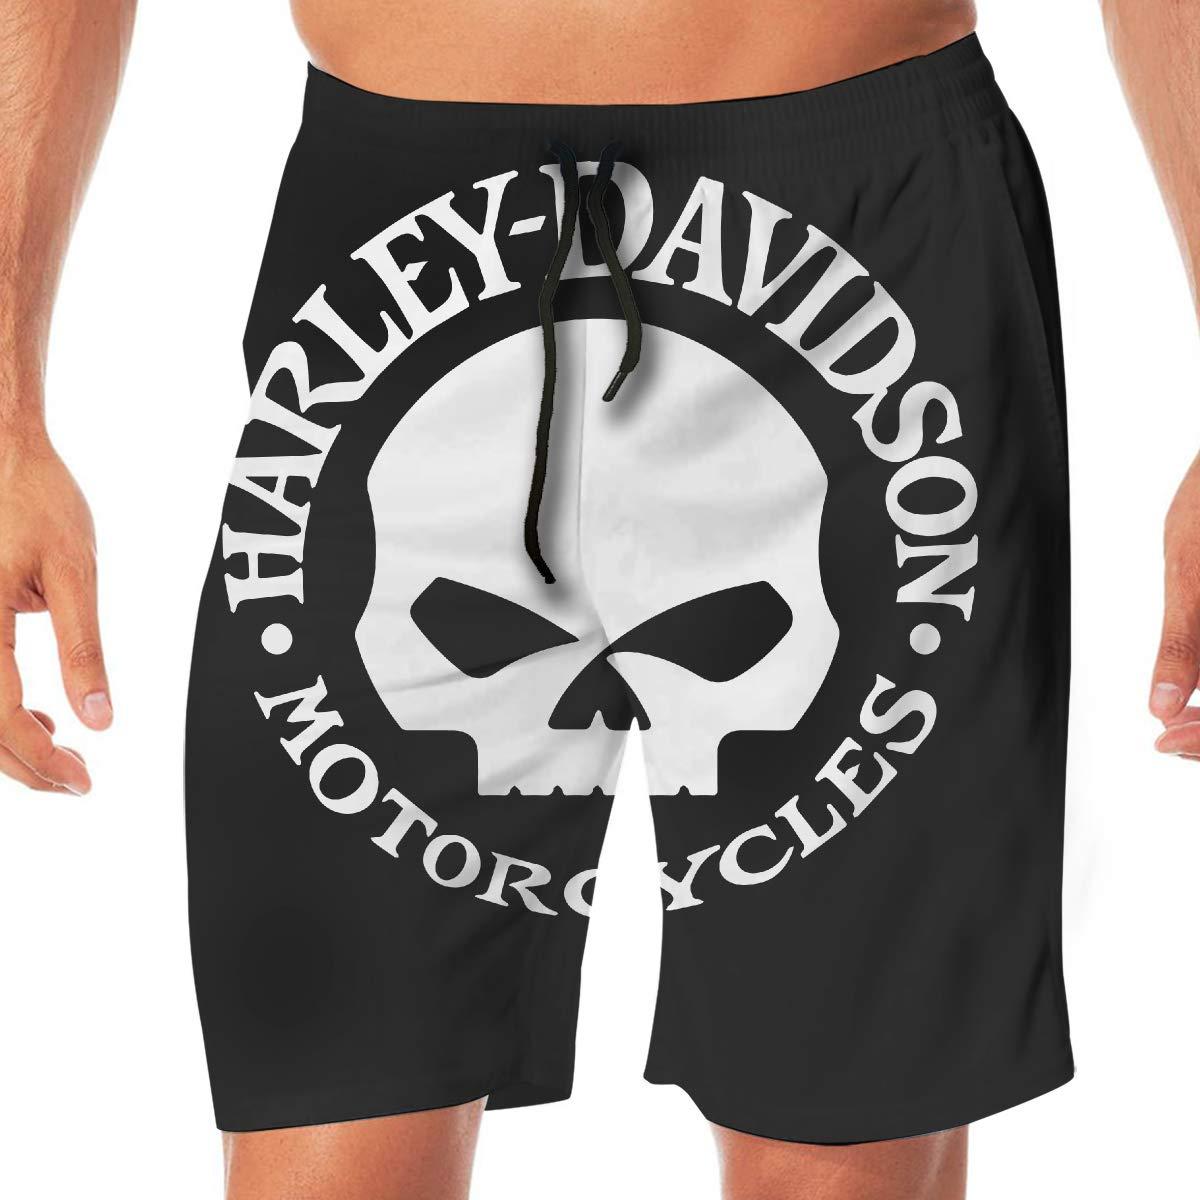 REBELN Mens Harley Davidson Logo Mens Summer Swim Trunks Quick Dry Funny Beach Board Shorts Casual Pants Printing